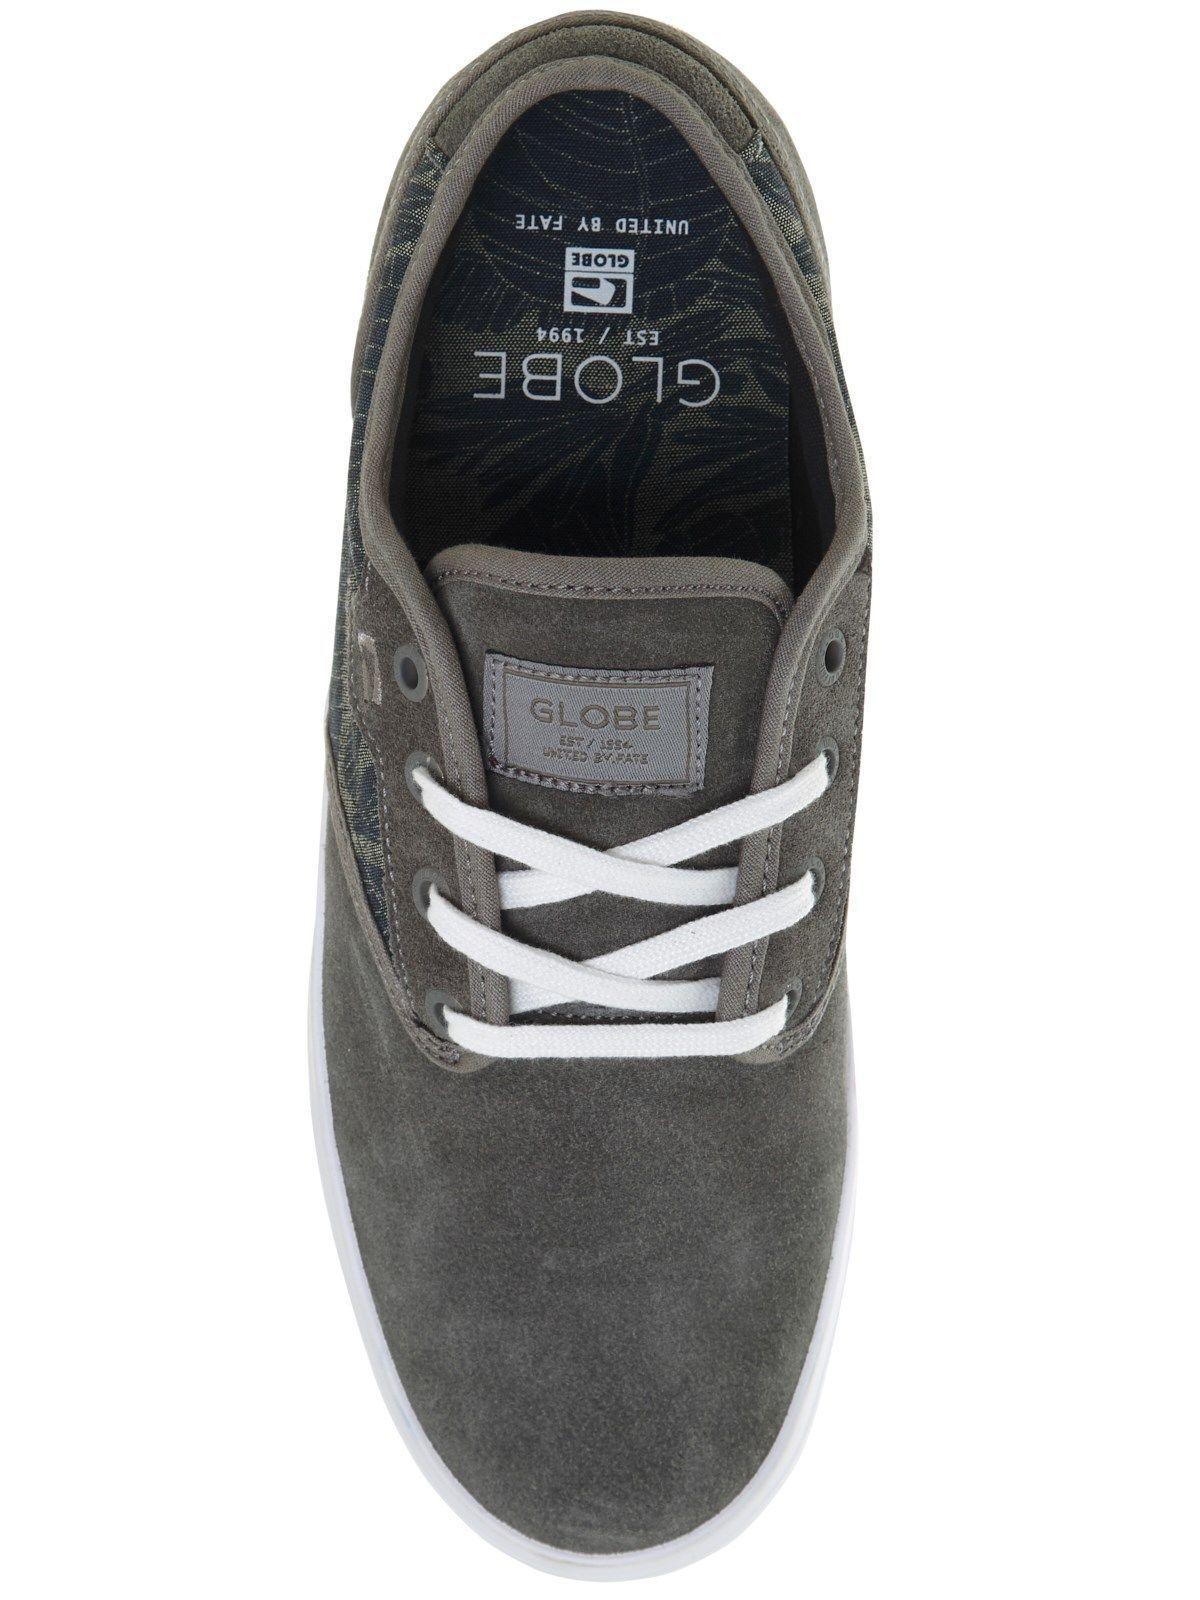 Uomo Uomo Uomo Globe Shoes MOTLEY Grigio Palma Chambray Palms Skate   af3d03